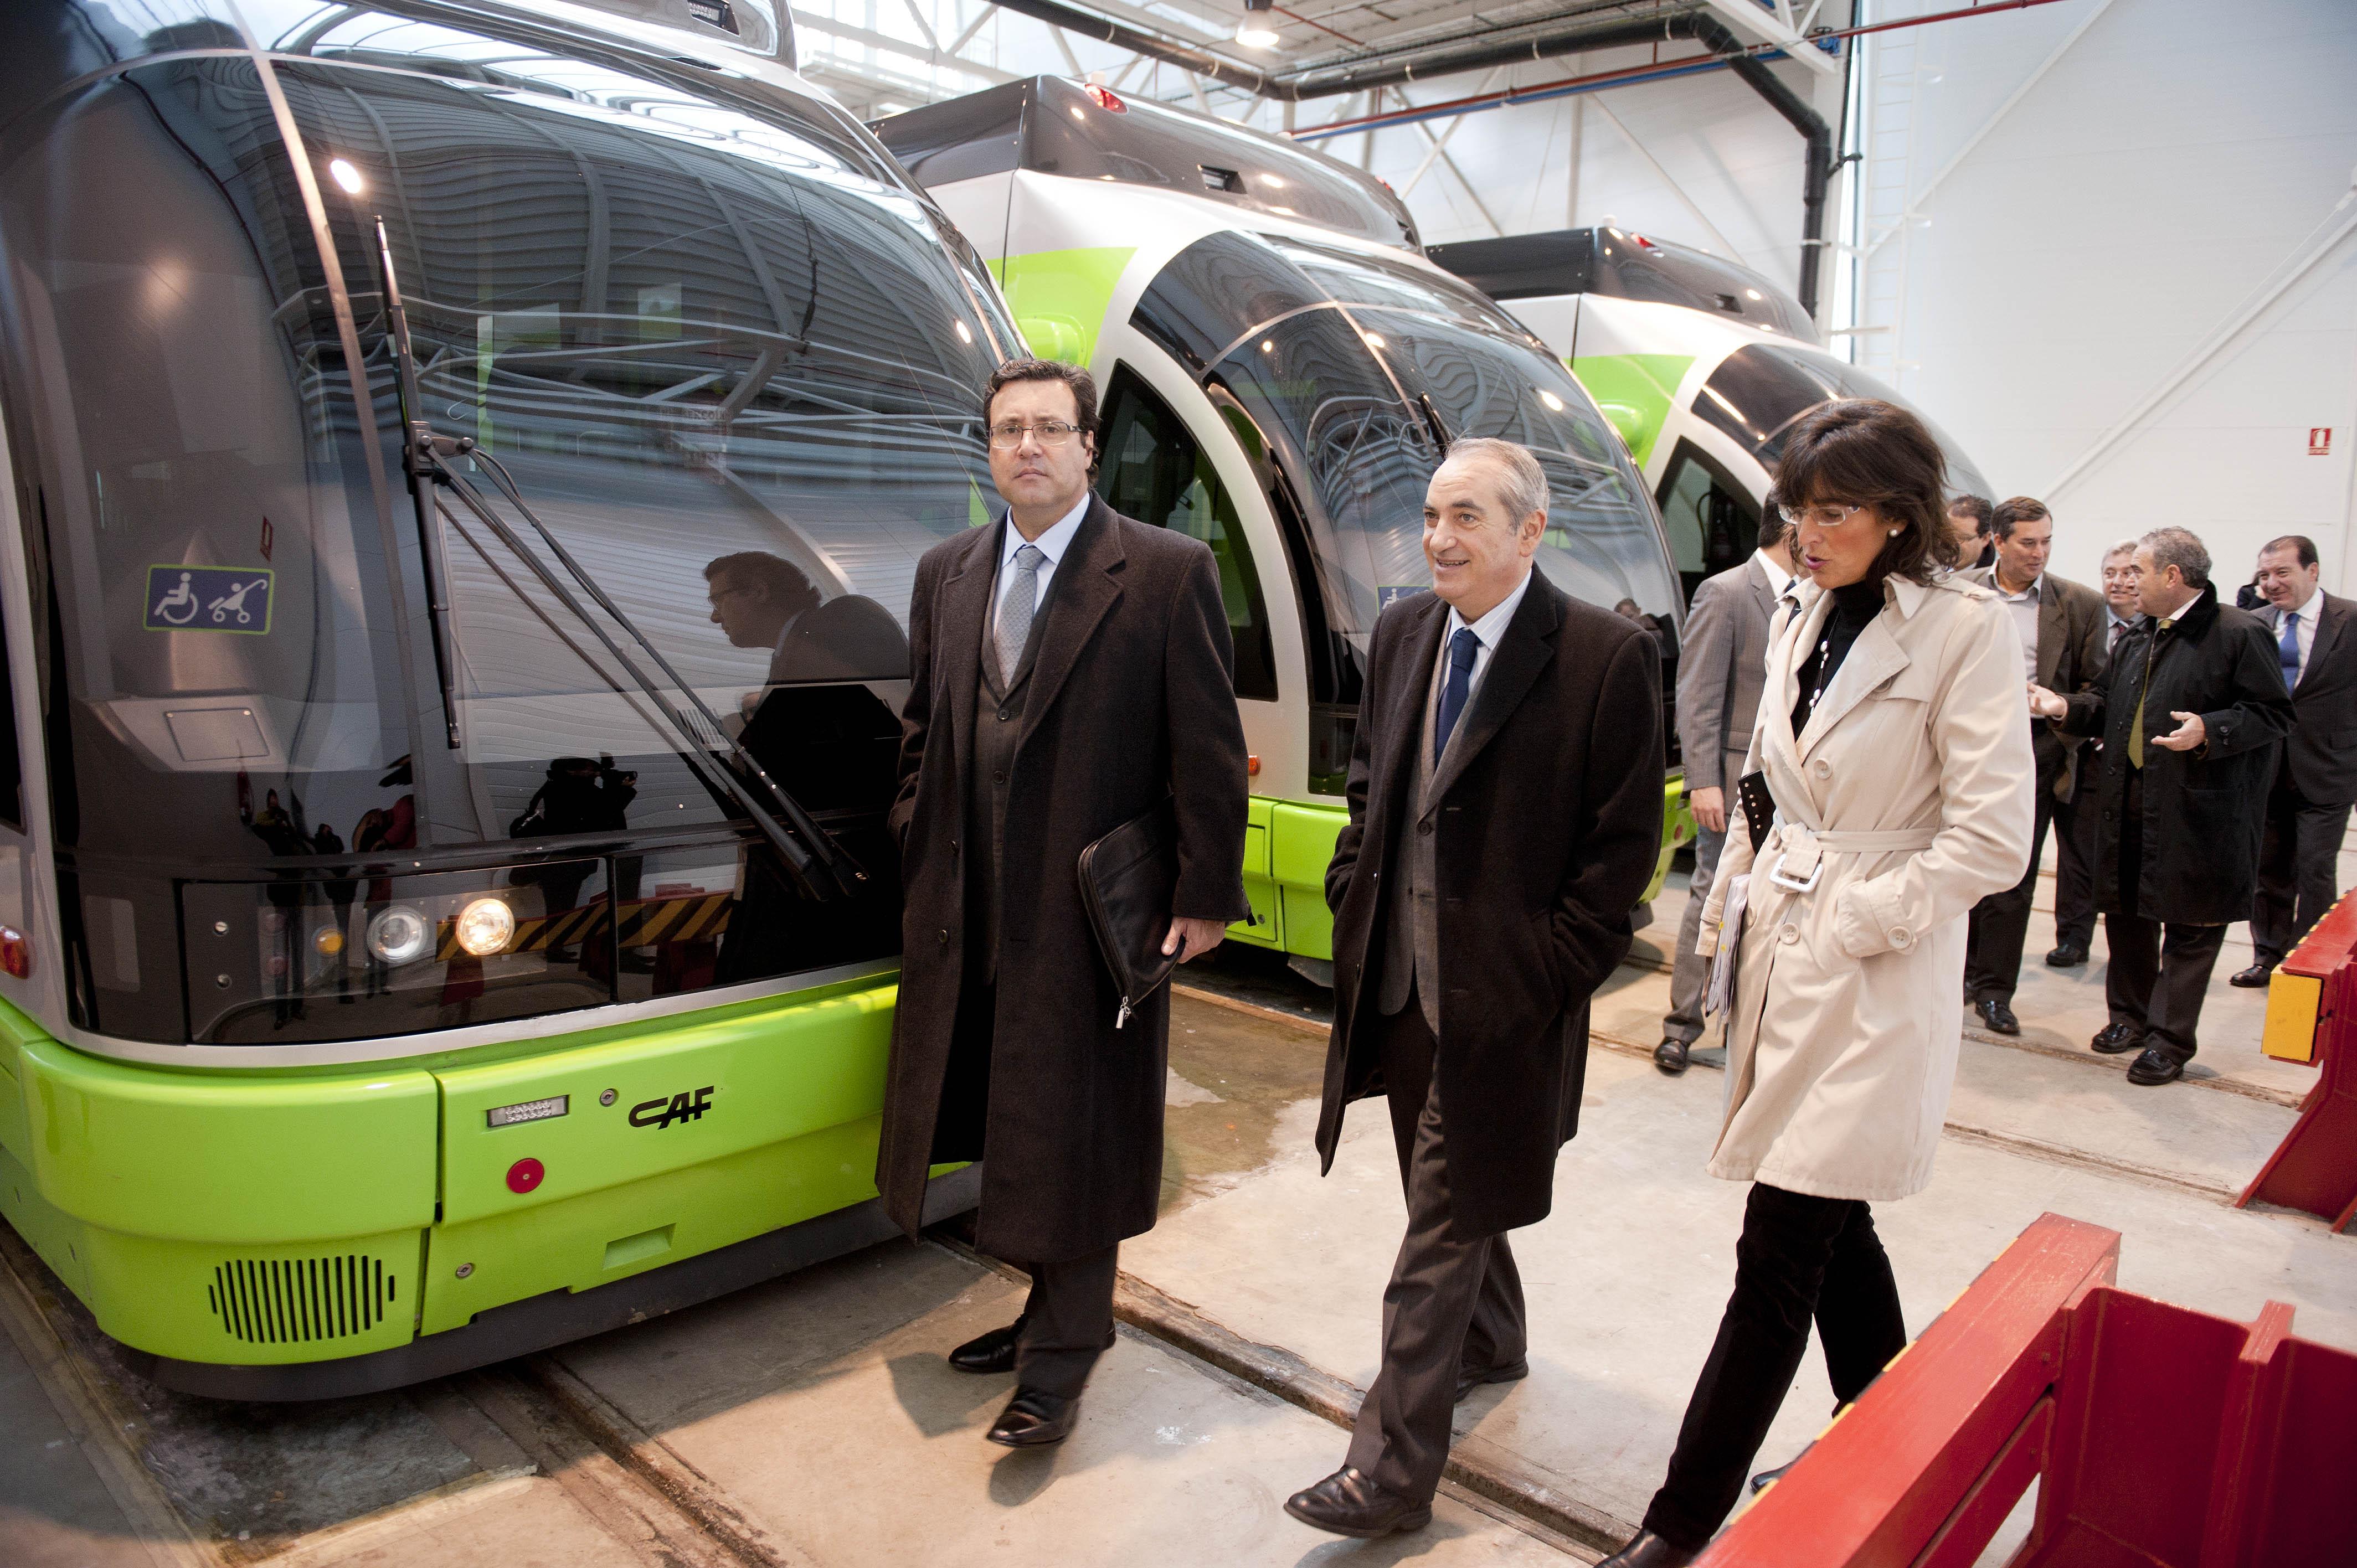 2012_01_20_arriola_metro_delegacion_brasilena13.jpg